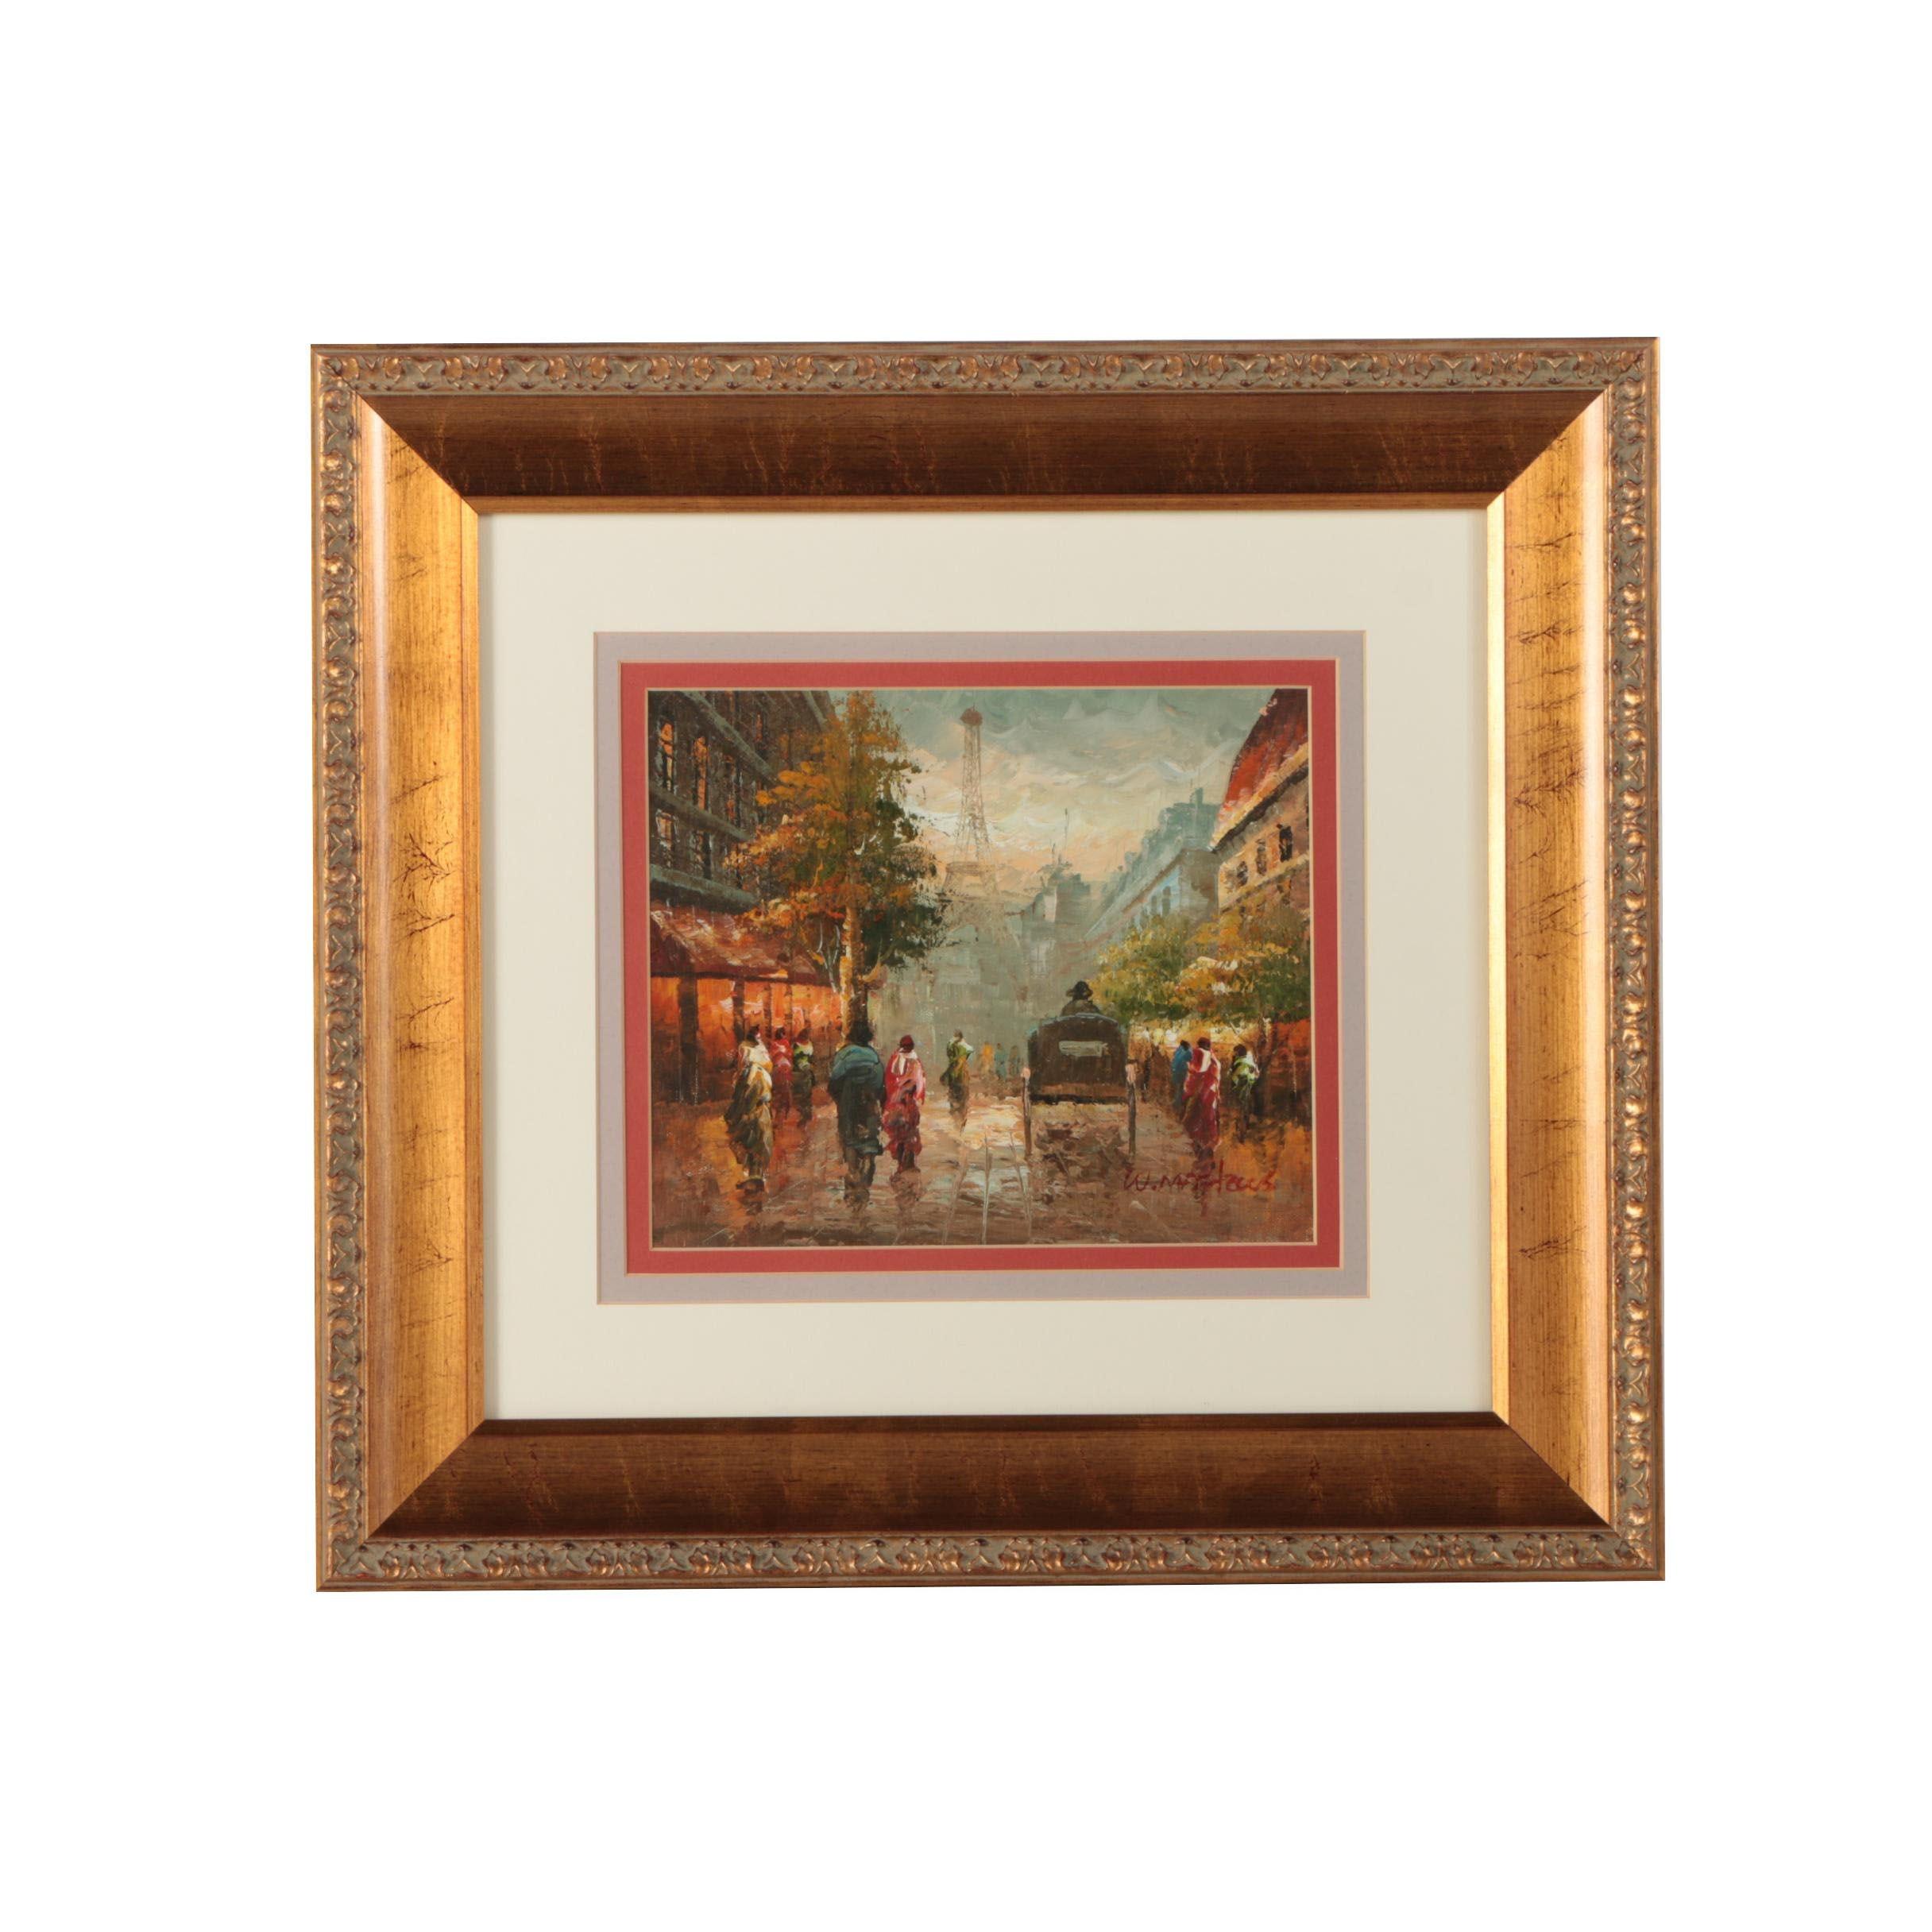 W. Mathews Oil Painting on Canvas Board of Parisian Street Scene